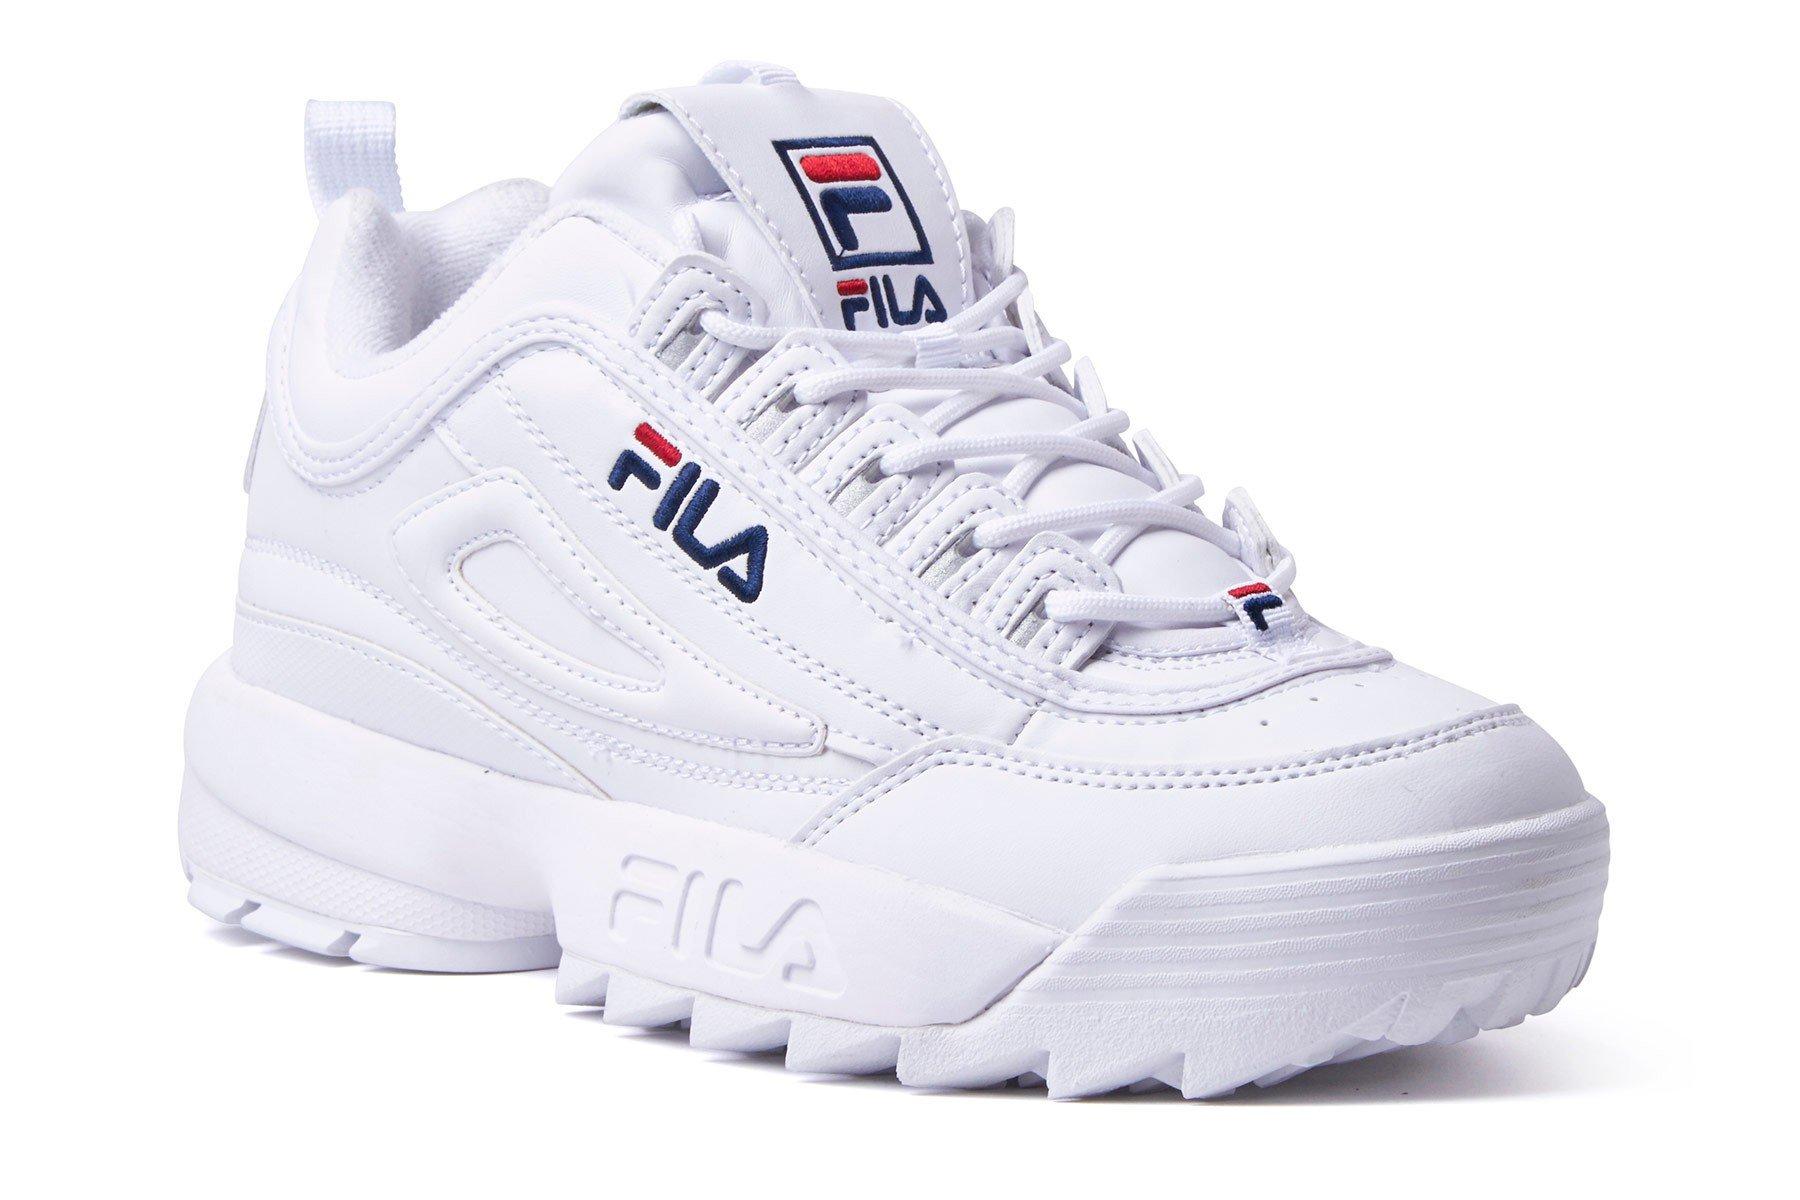 Fila Women's Disruptor II Premium Sneakers, White Navy Red, 9 B(M) US